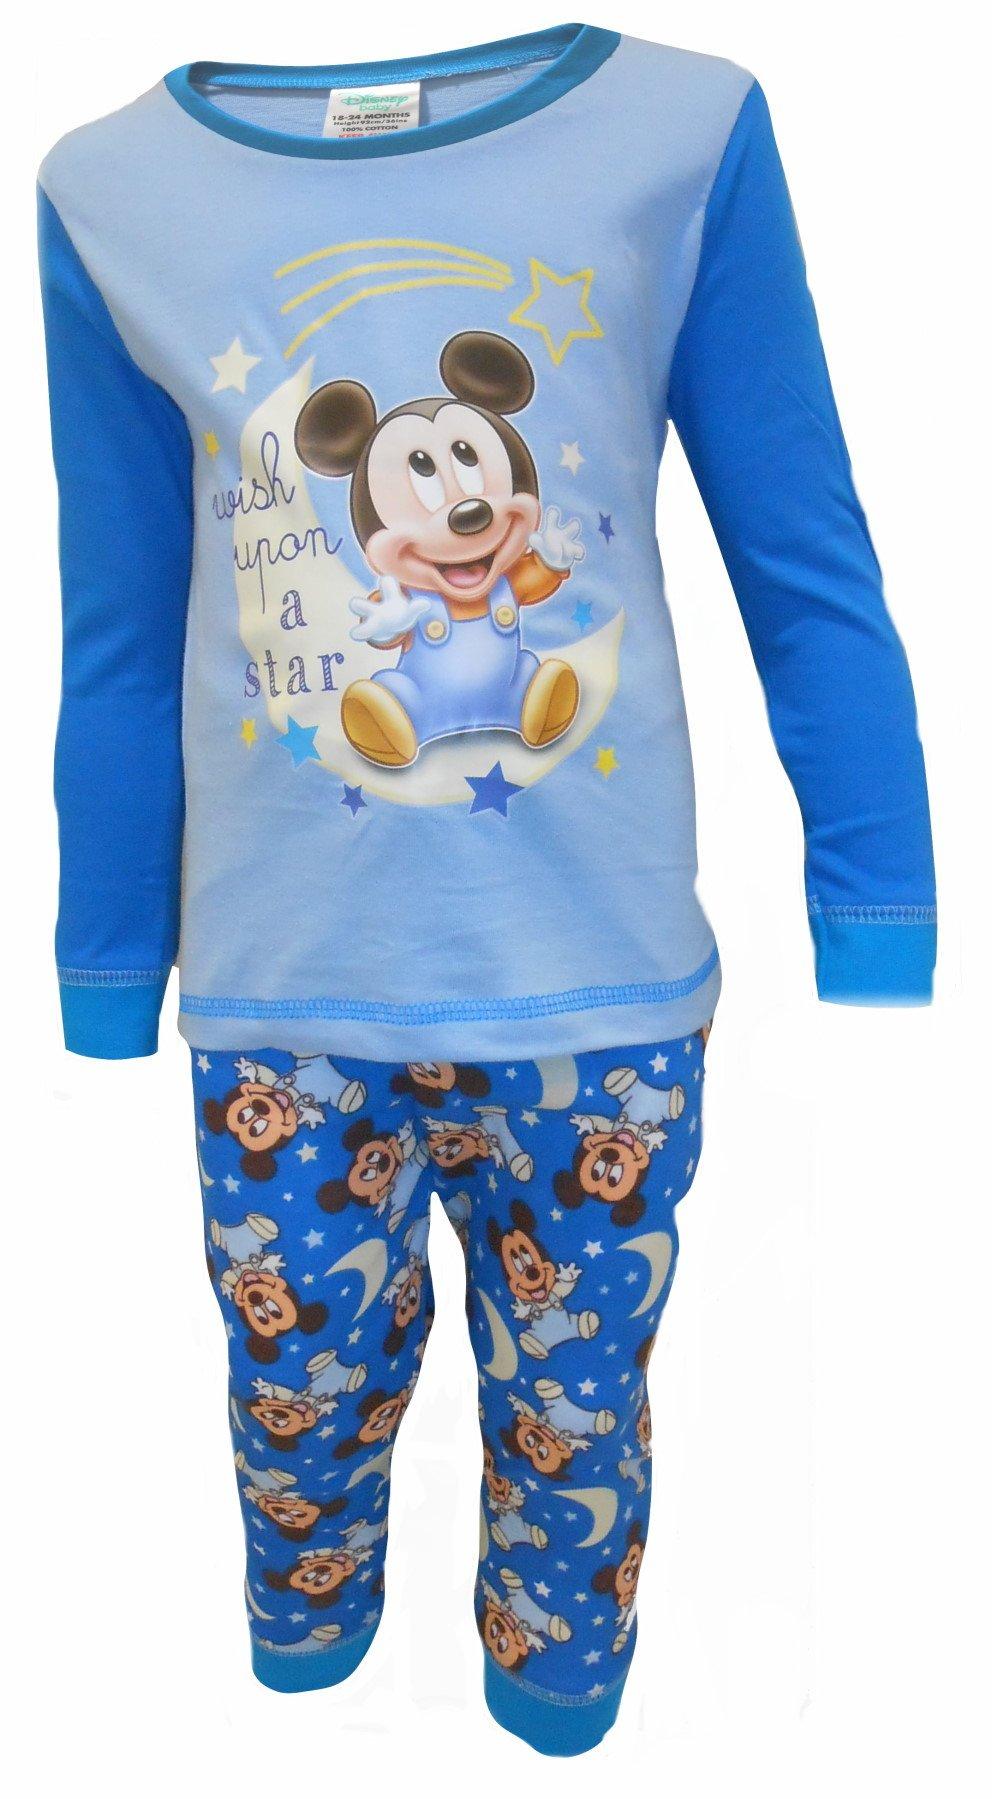 Boys Disney Mickey Mouse Pluto Kids Pyjamas Pjs Nightwear Size 3-4 Years